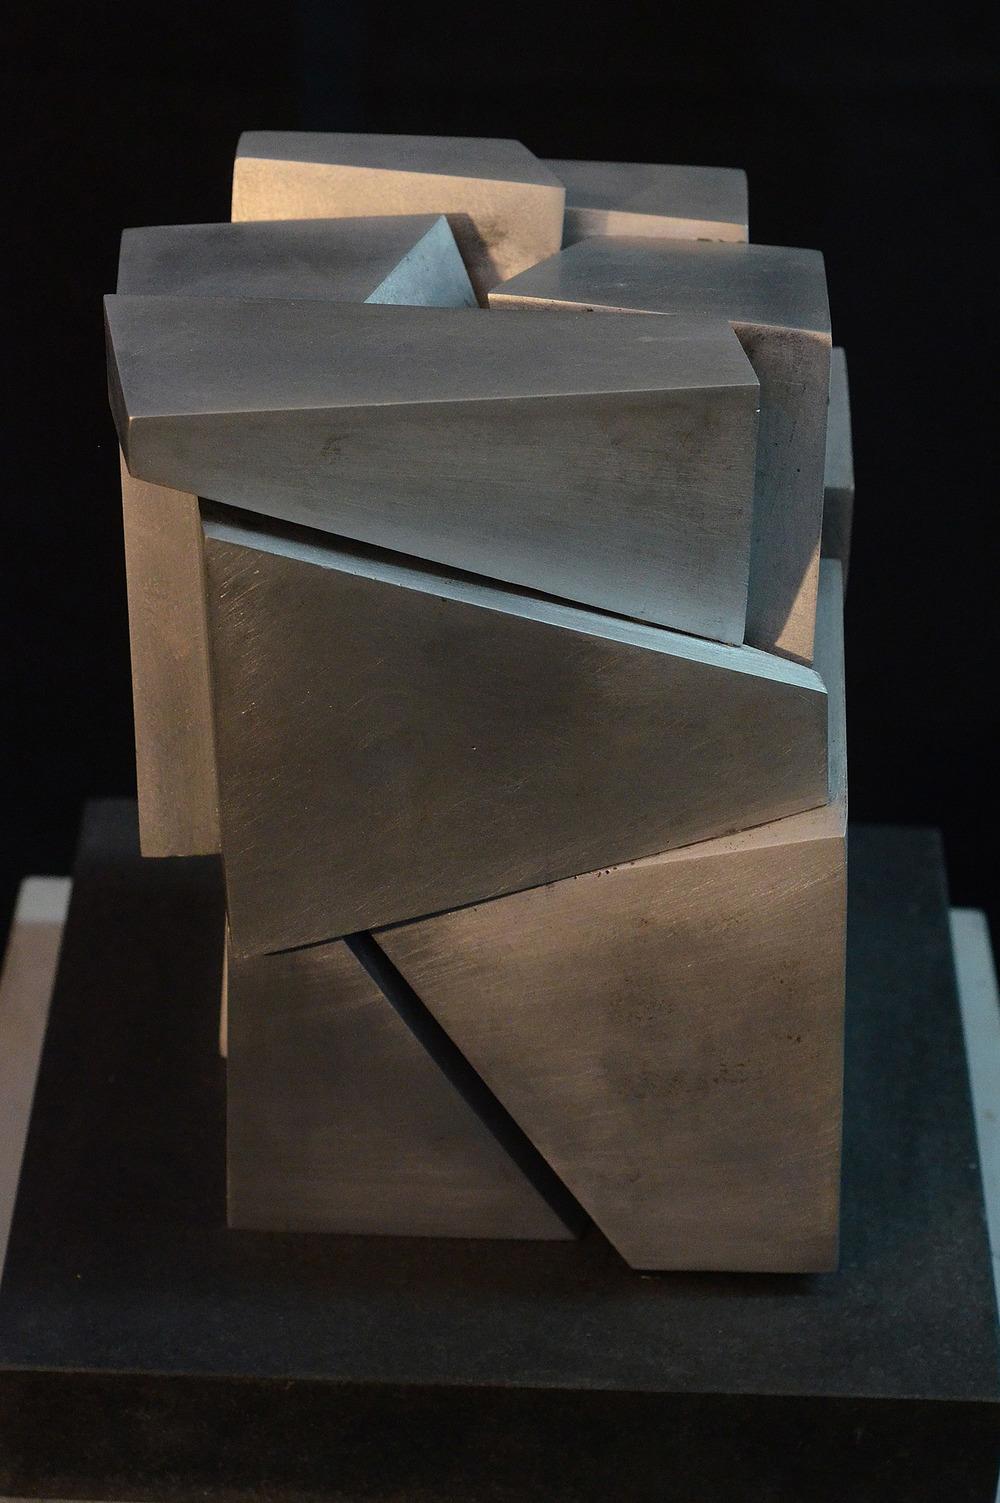 segmented-prism-101.jpg